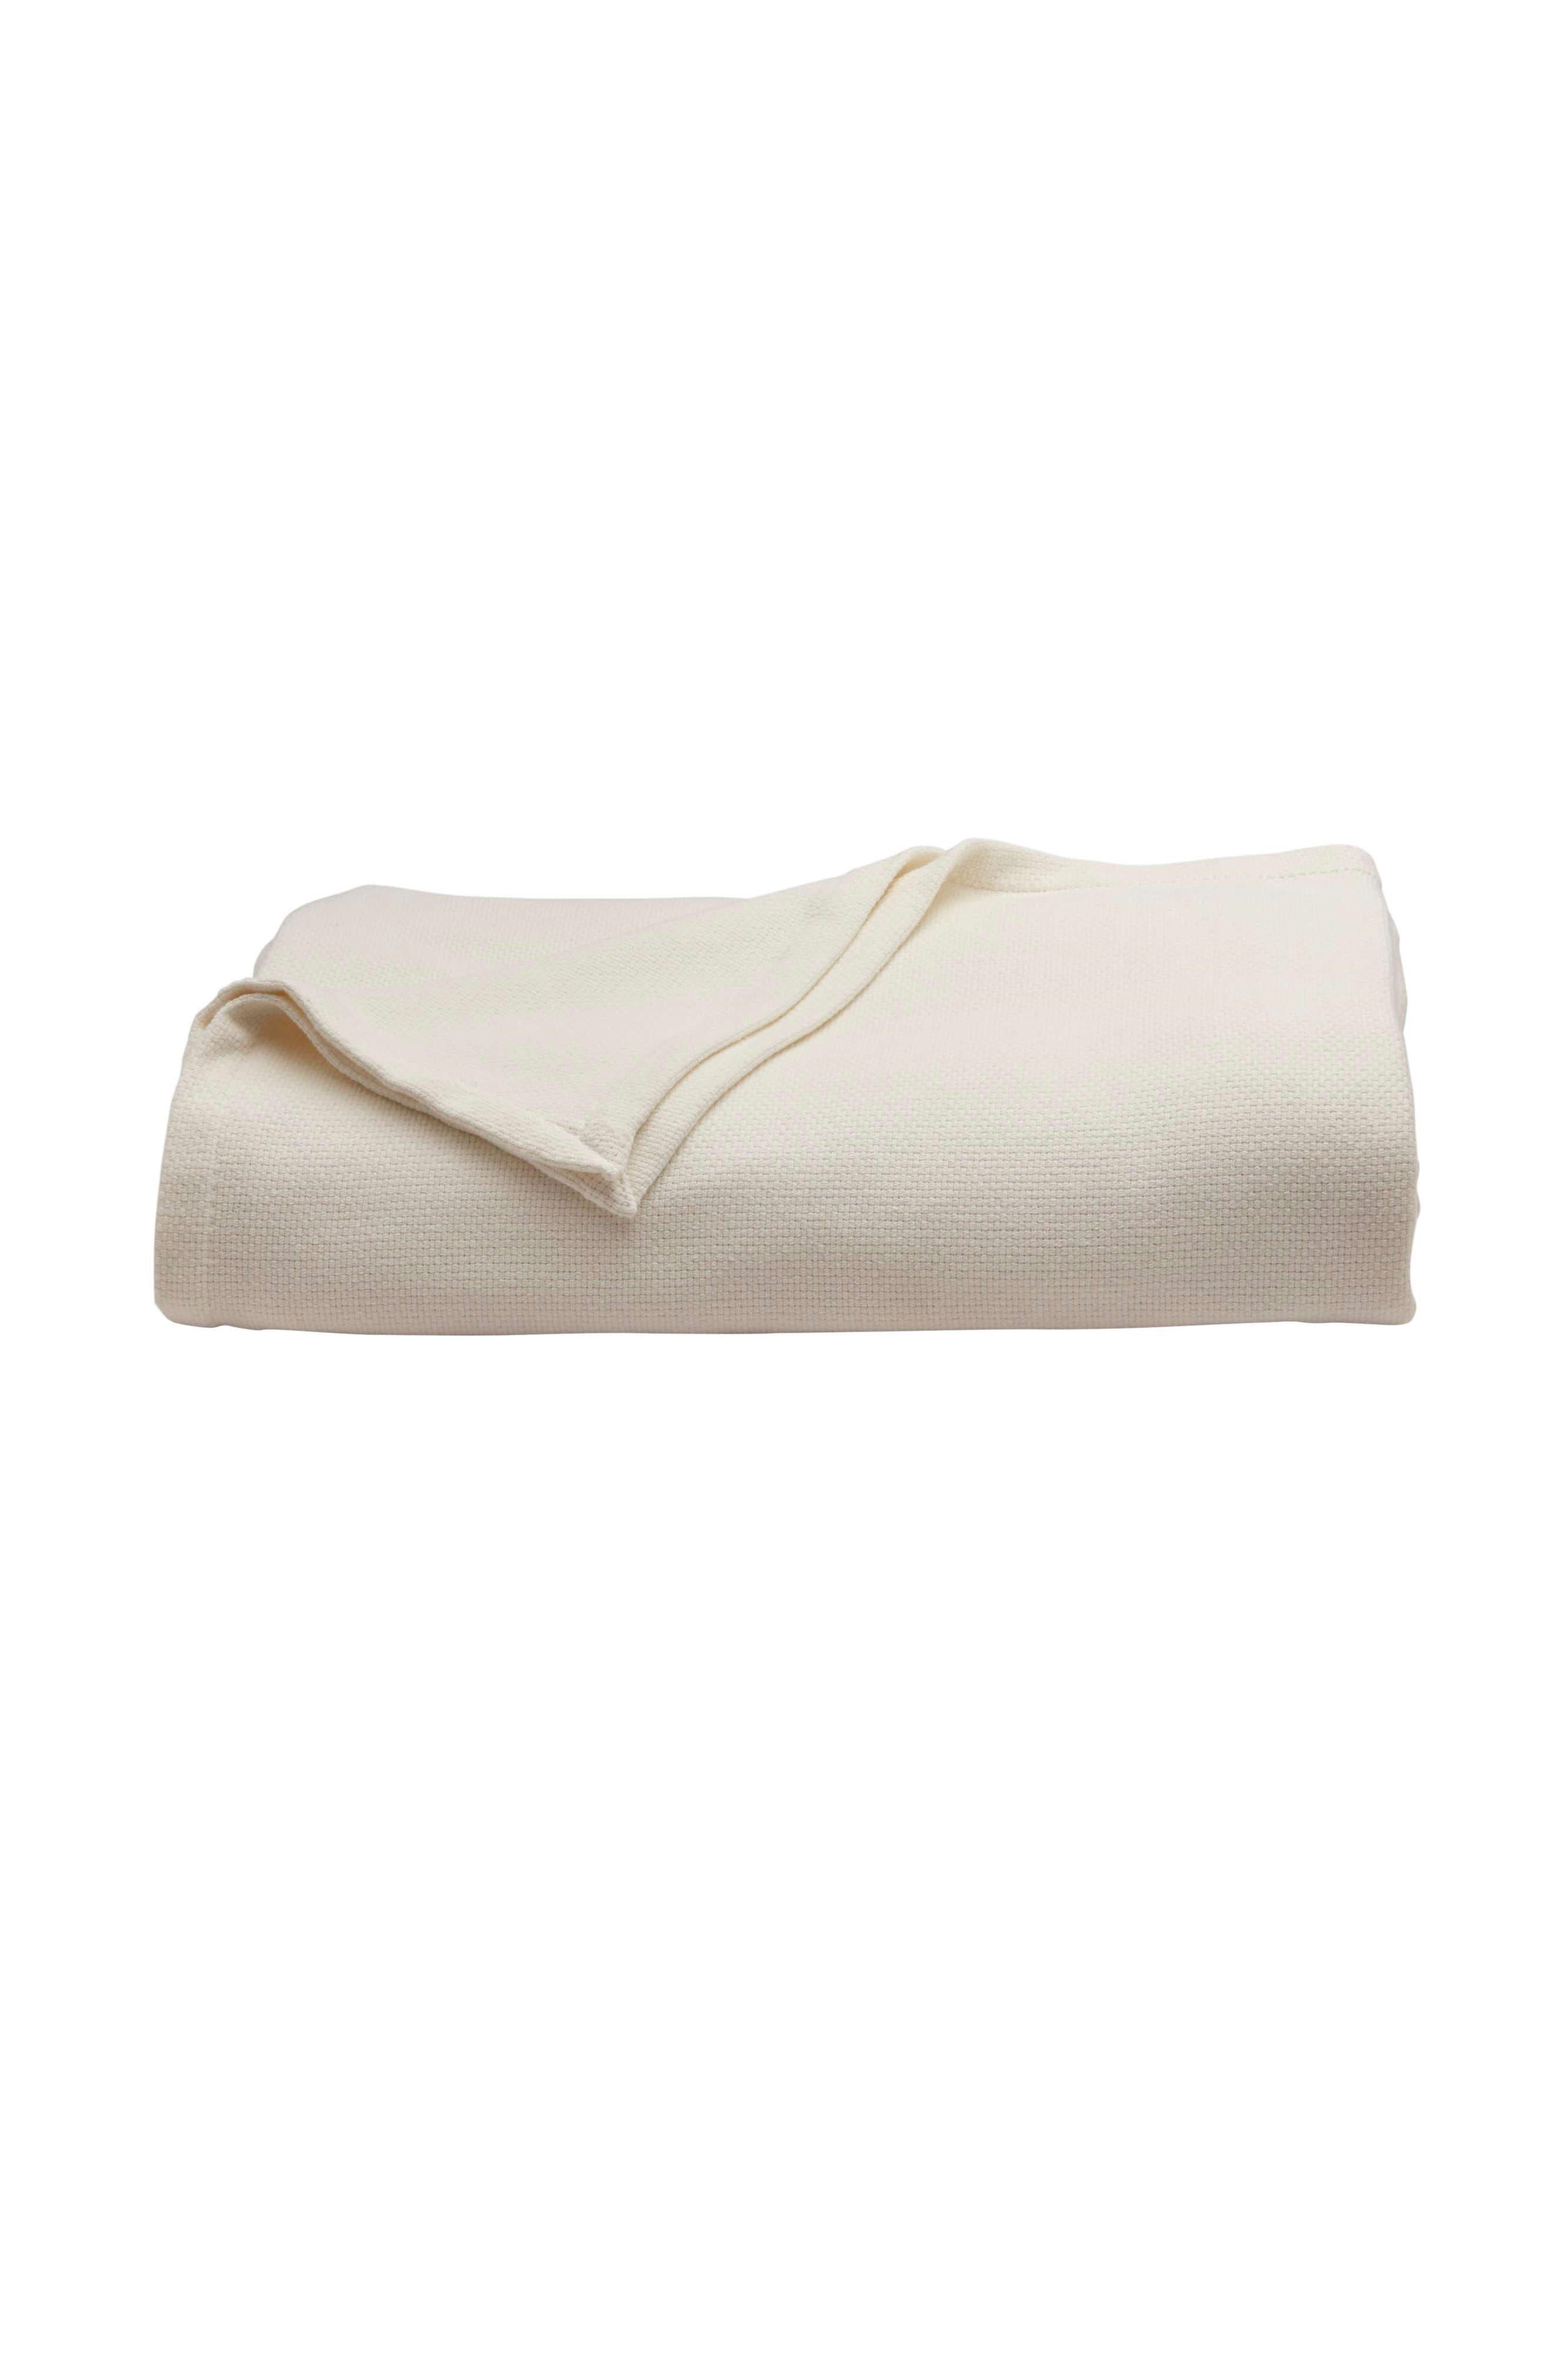 Samara Blanket,                         Main,                         color, WHITE